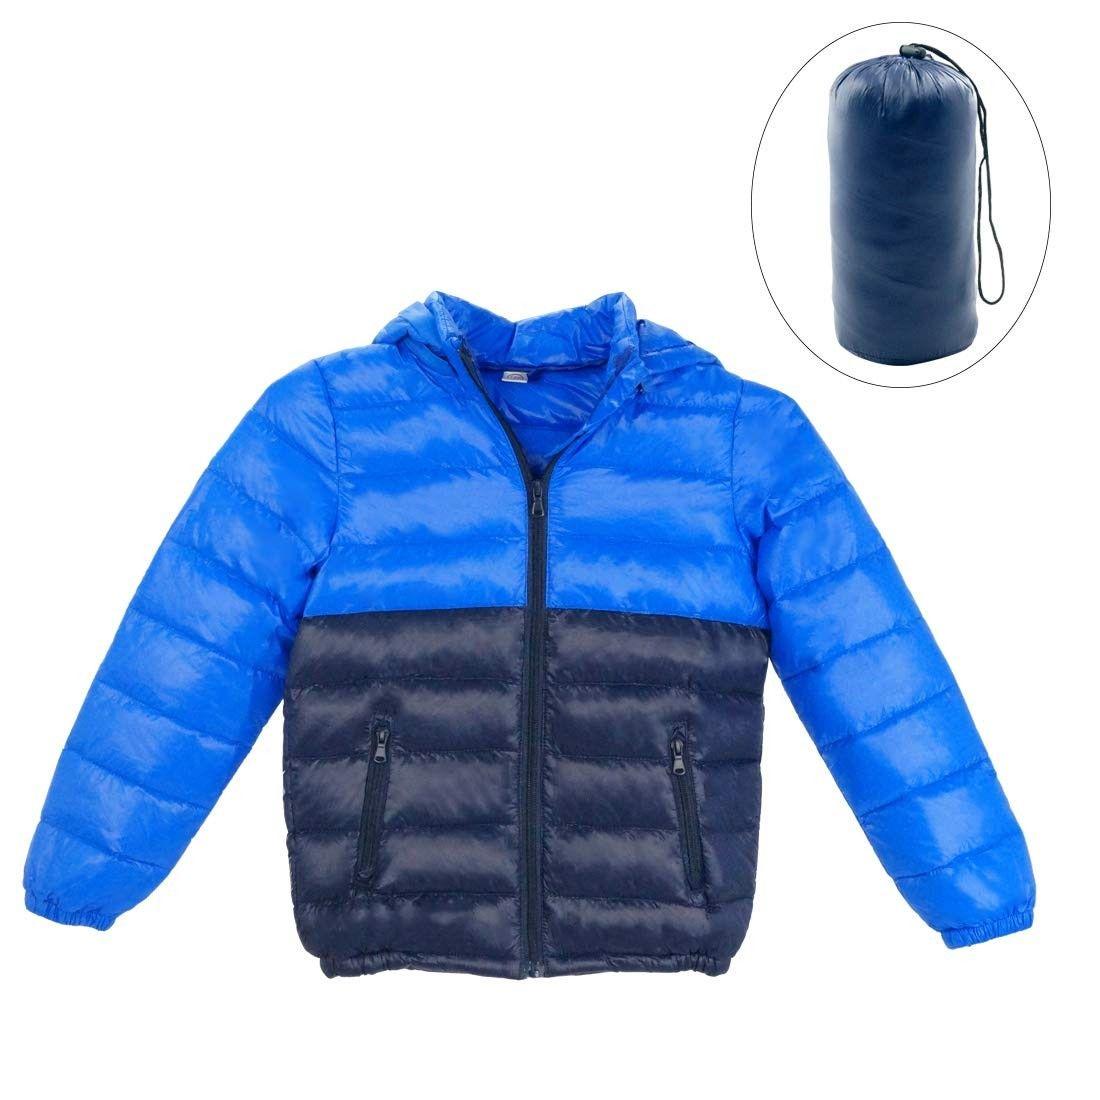 Boys Down Winter Coat Thin Warm Removable Hood Zipper Puffer Jacket 3 9t Deep Blue Cy1874o09sk Size 3 4 Years Down Winter Coats Kids Outdoor Clothes Winter Coat [ 1100 x 1100 Pixel ]